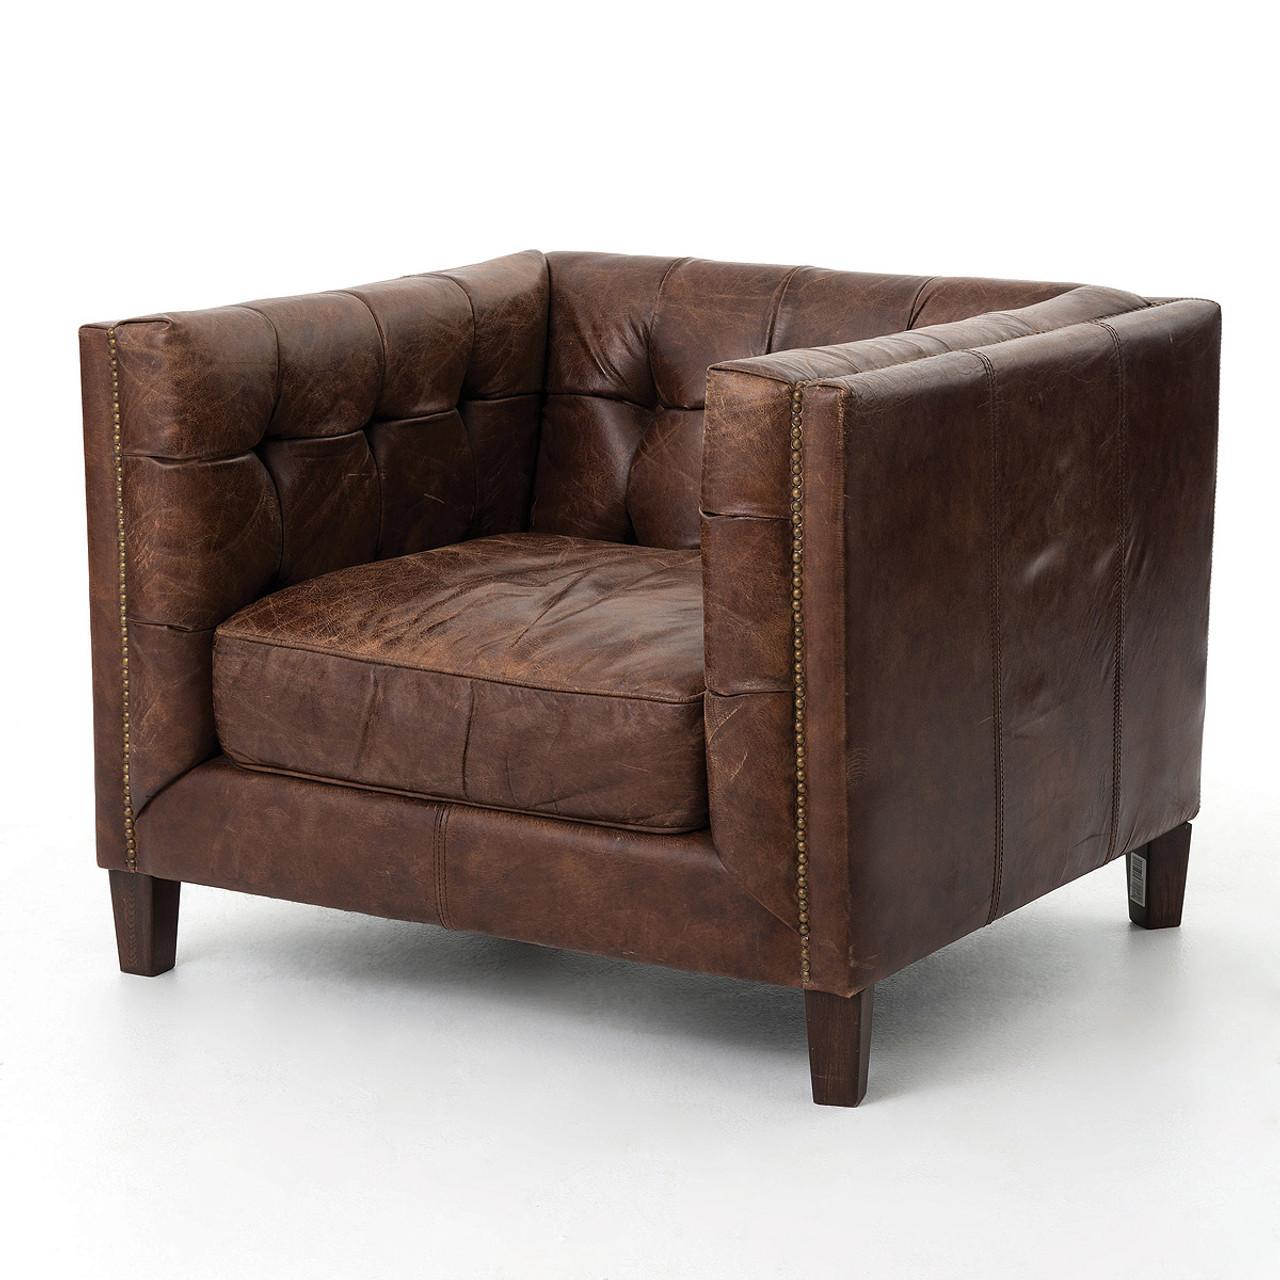 Abbott Vintage Cigar Tufted Leather Club Chair  sc 1 st  Zin Home & Abbott Vintage Cigar Tufted Leather Club Chair | Zin Home